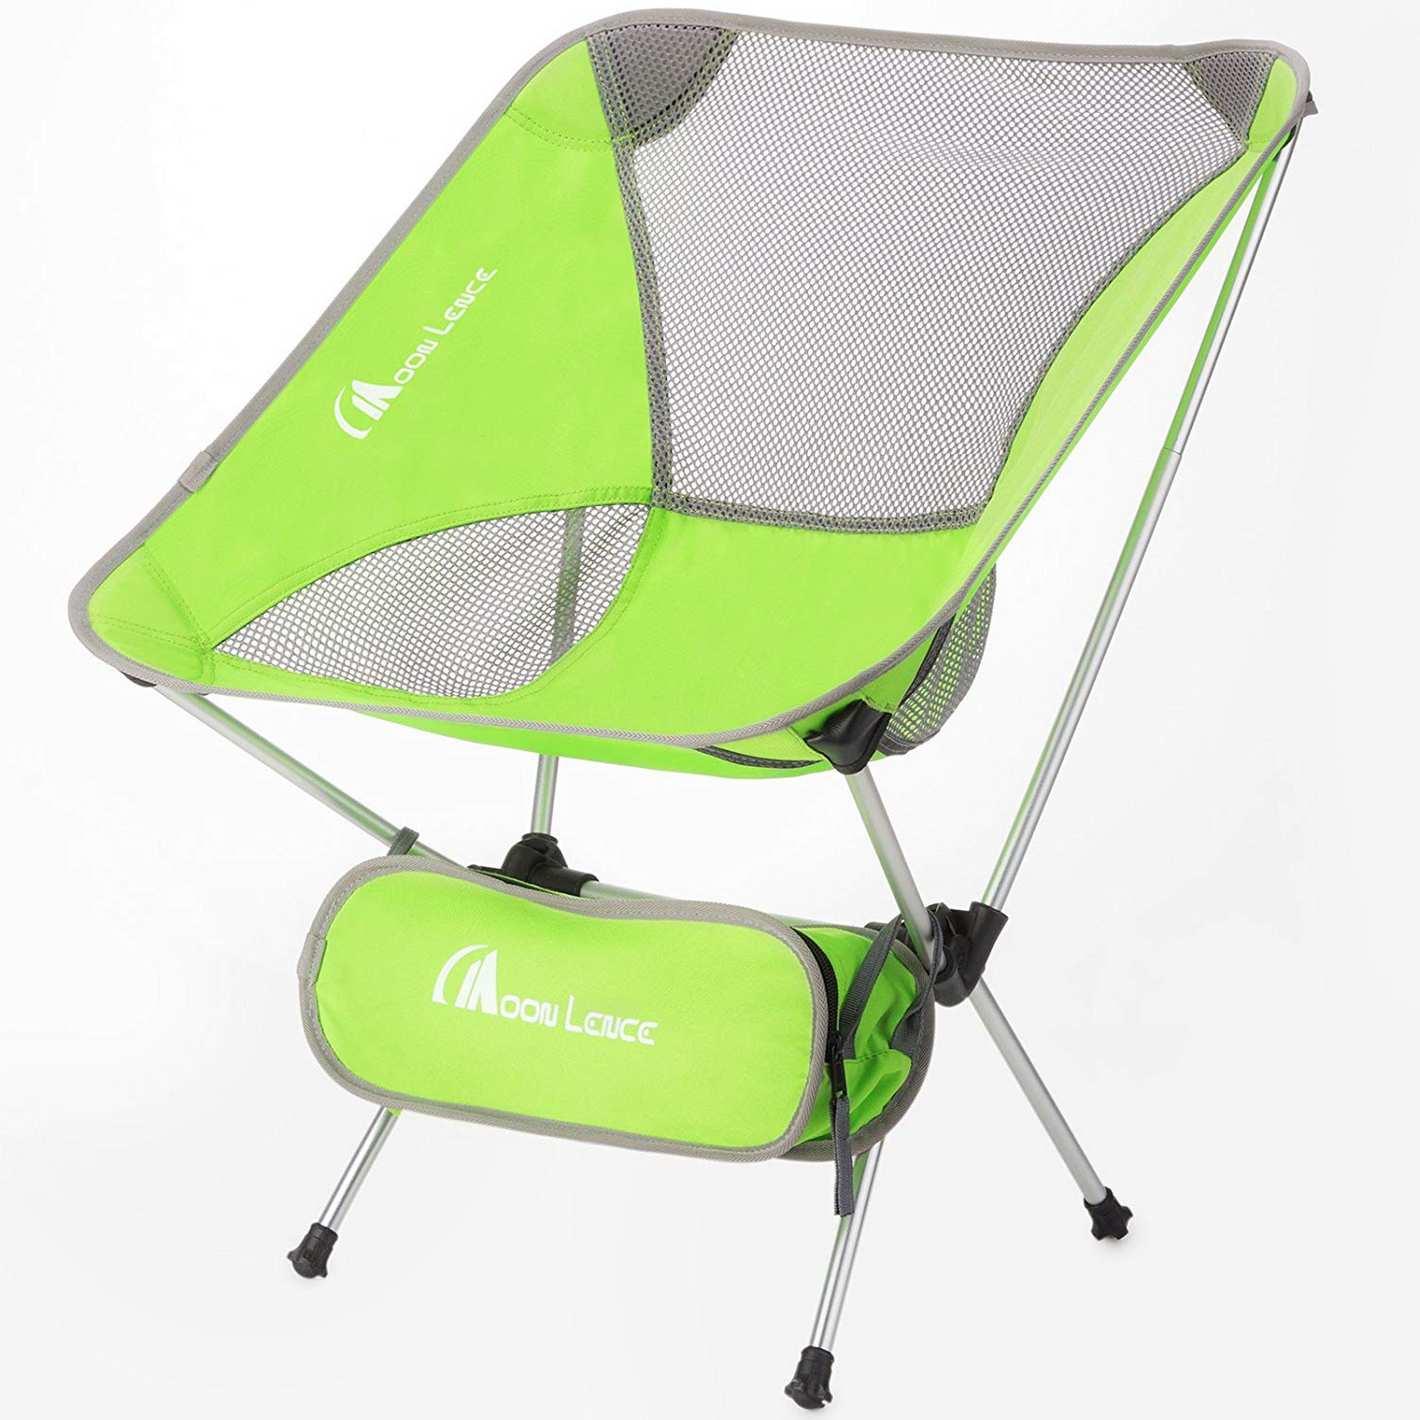 MOON LENCE Ultralight Folding Camping Chair